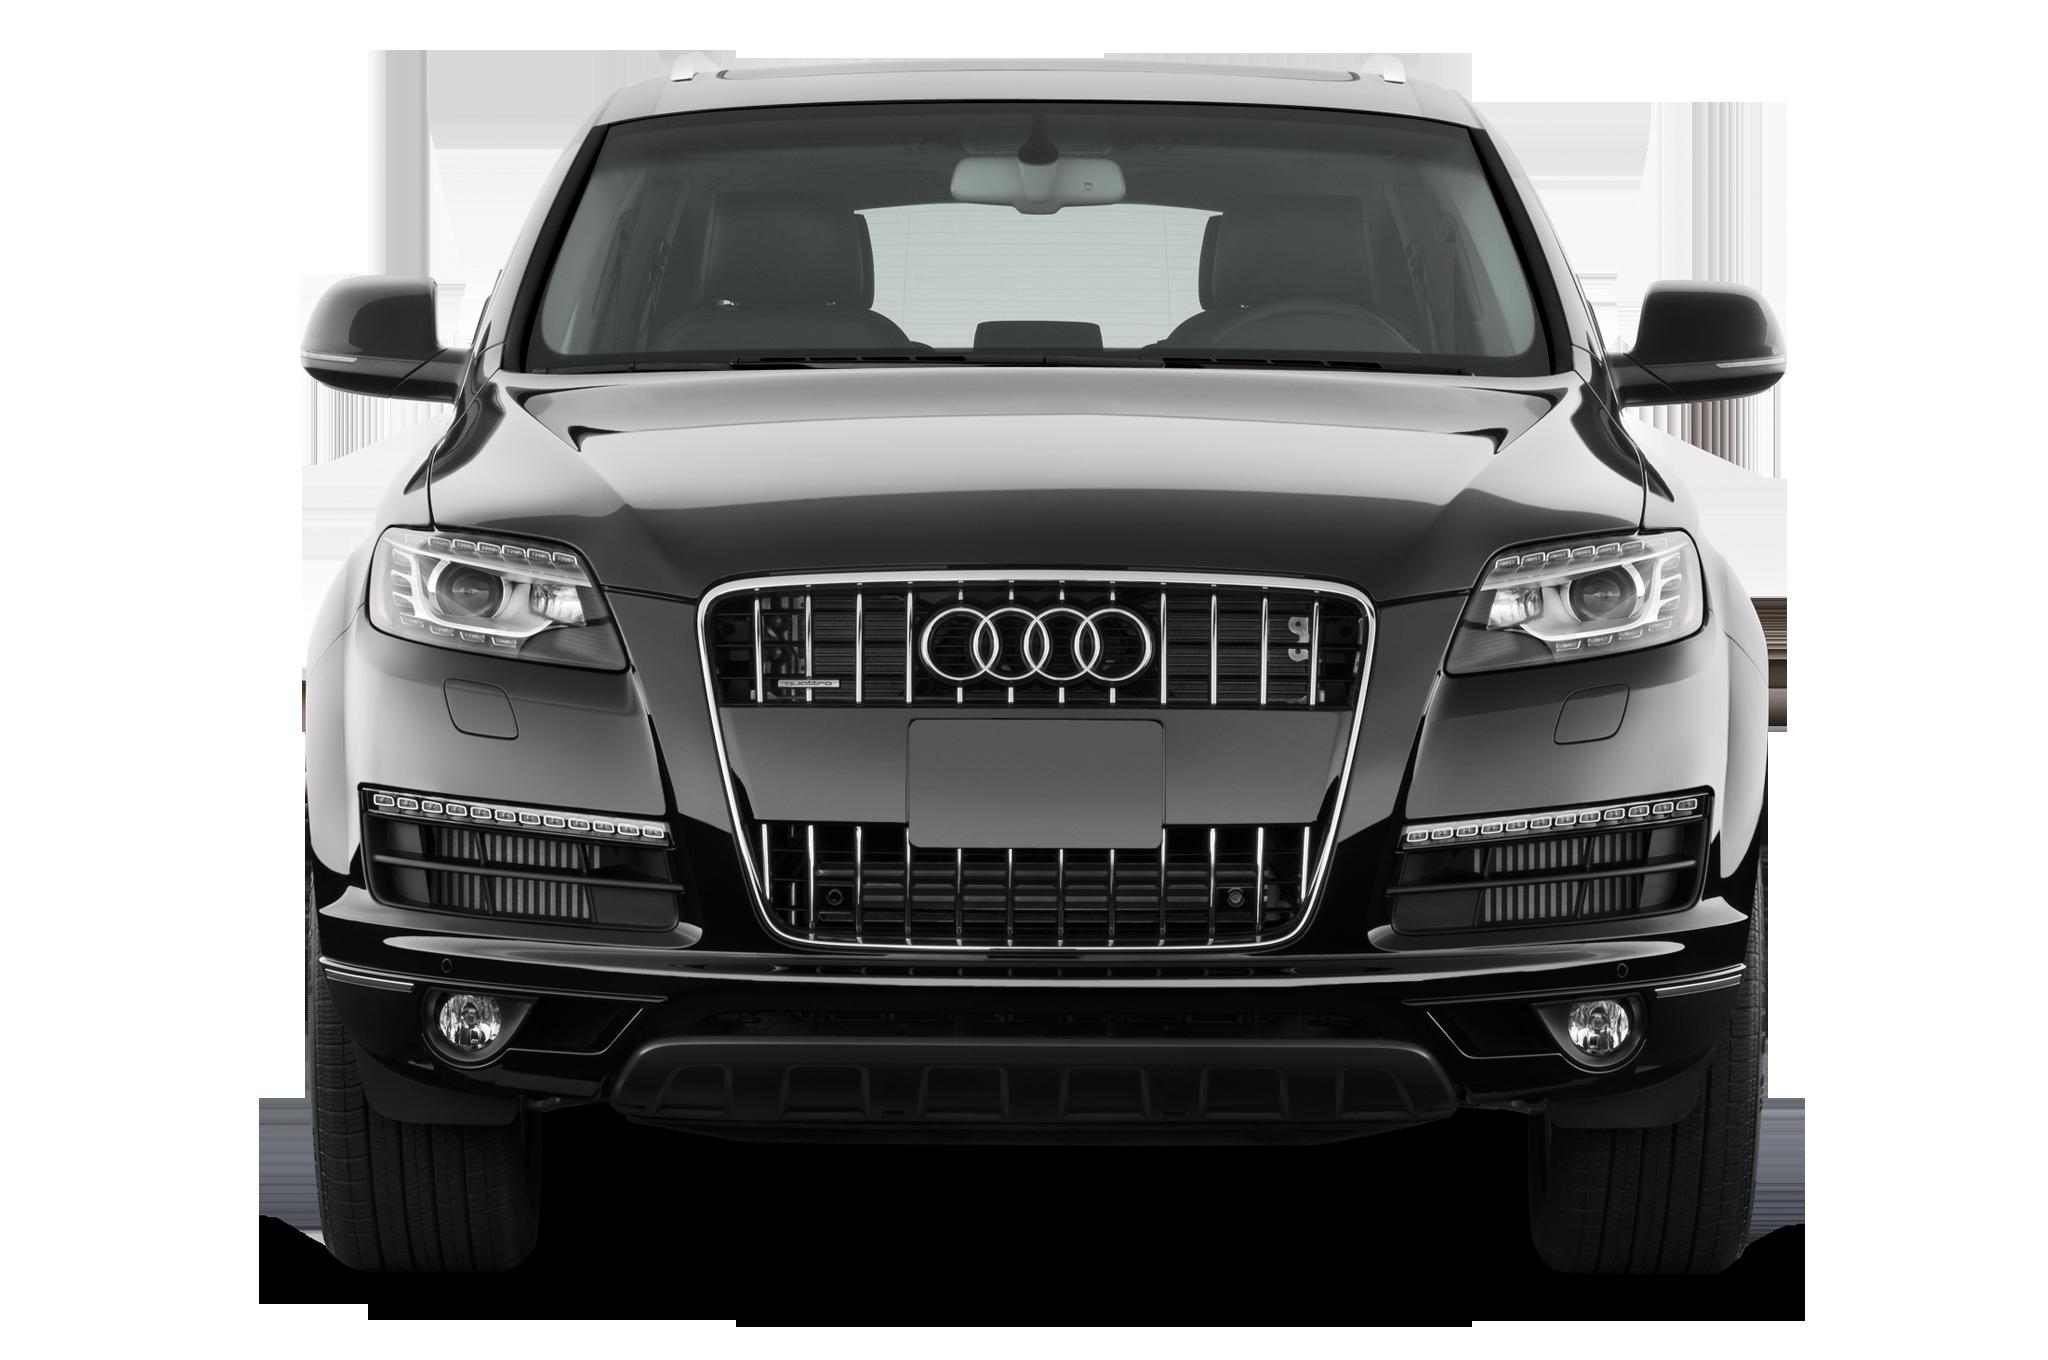 wheel photos reviews quattro price features sport photo utility suv drive audi all premium